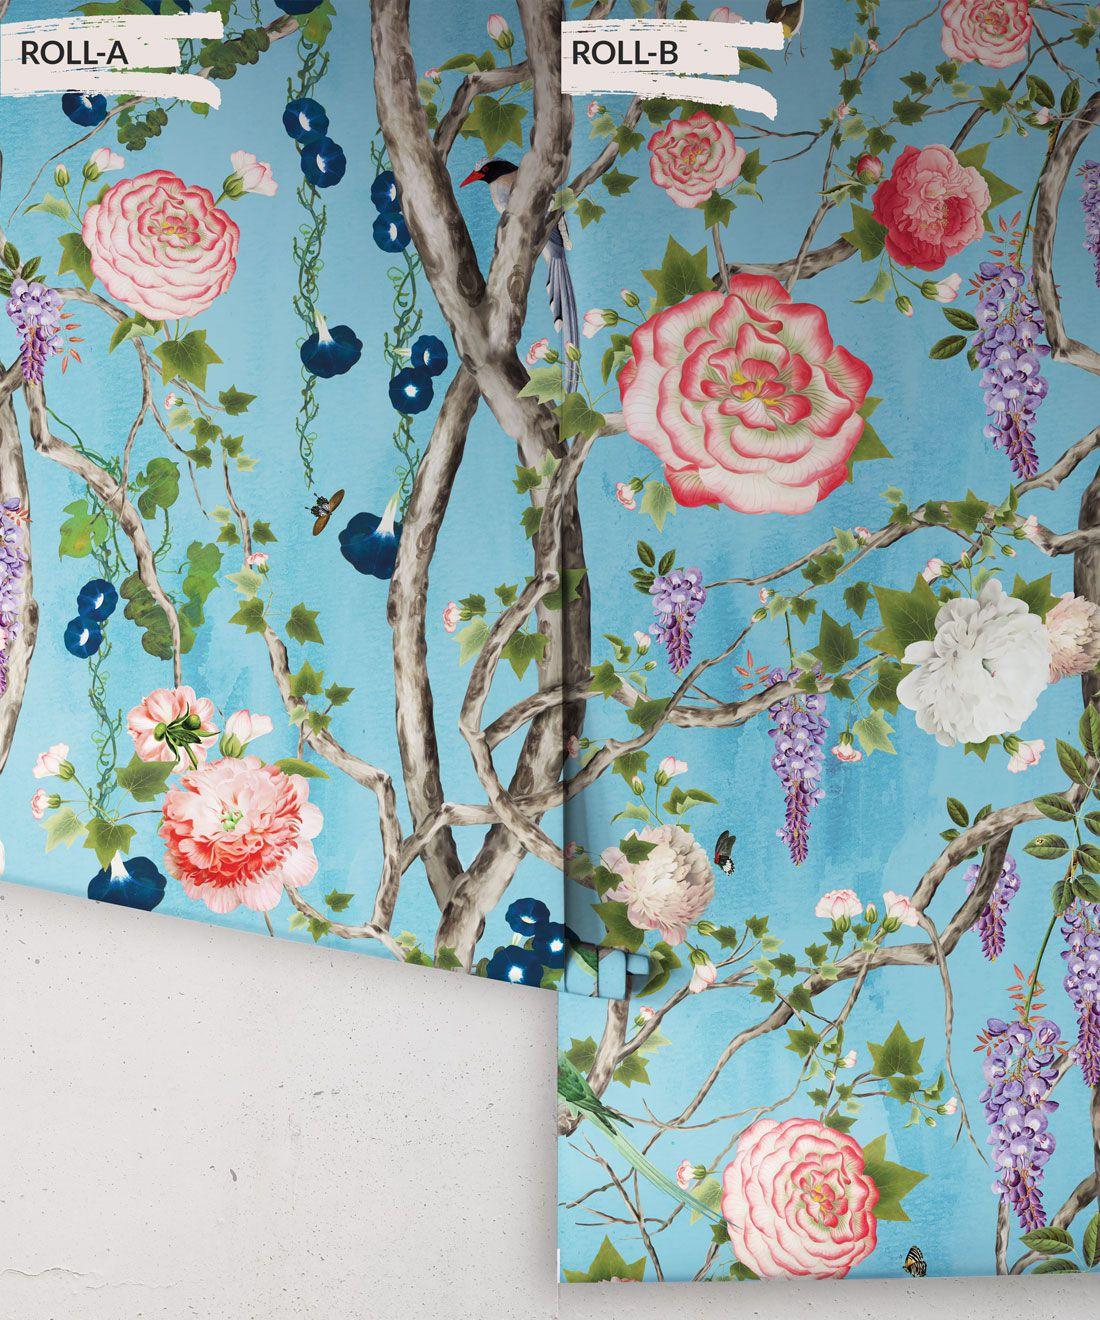 Empress Wallpaper • Romantic Wallpaper • Floral Wallpaper • Chinoiserie Wallpaper • Sky Blue colour wallpaper rolls